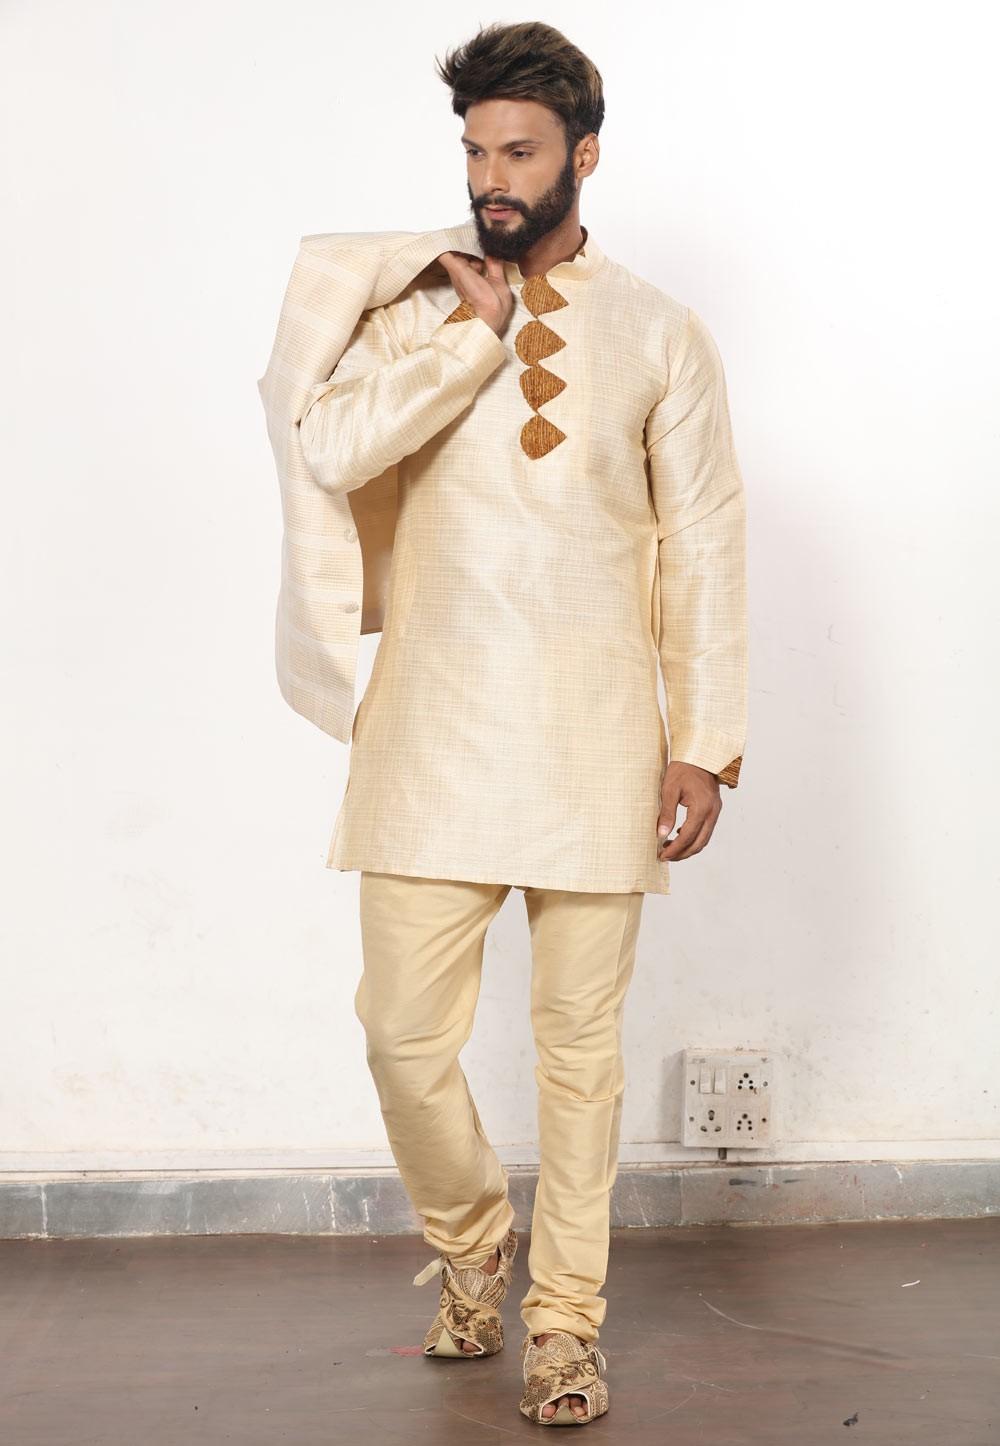 Men's Exquisite Golden Color Dupion Silk Readymade Kurta Pajama.